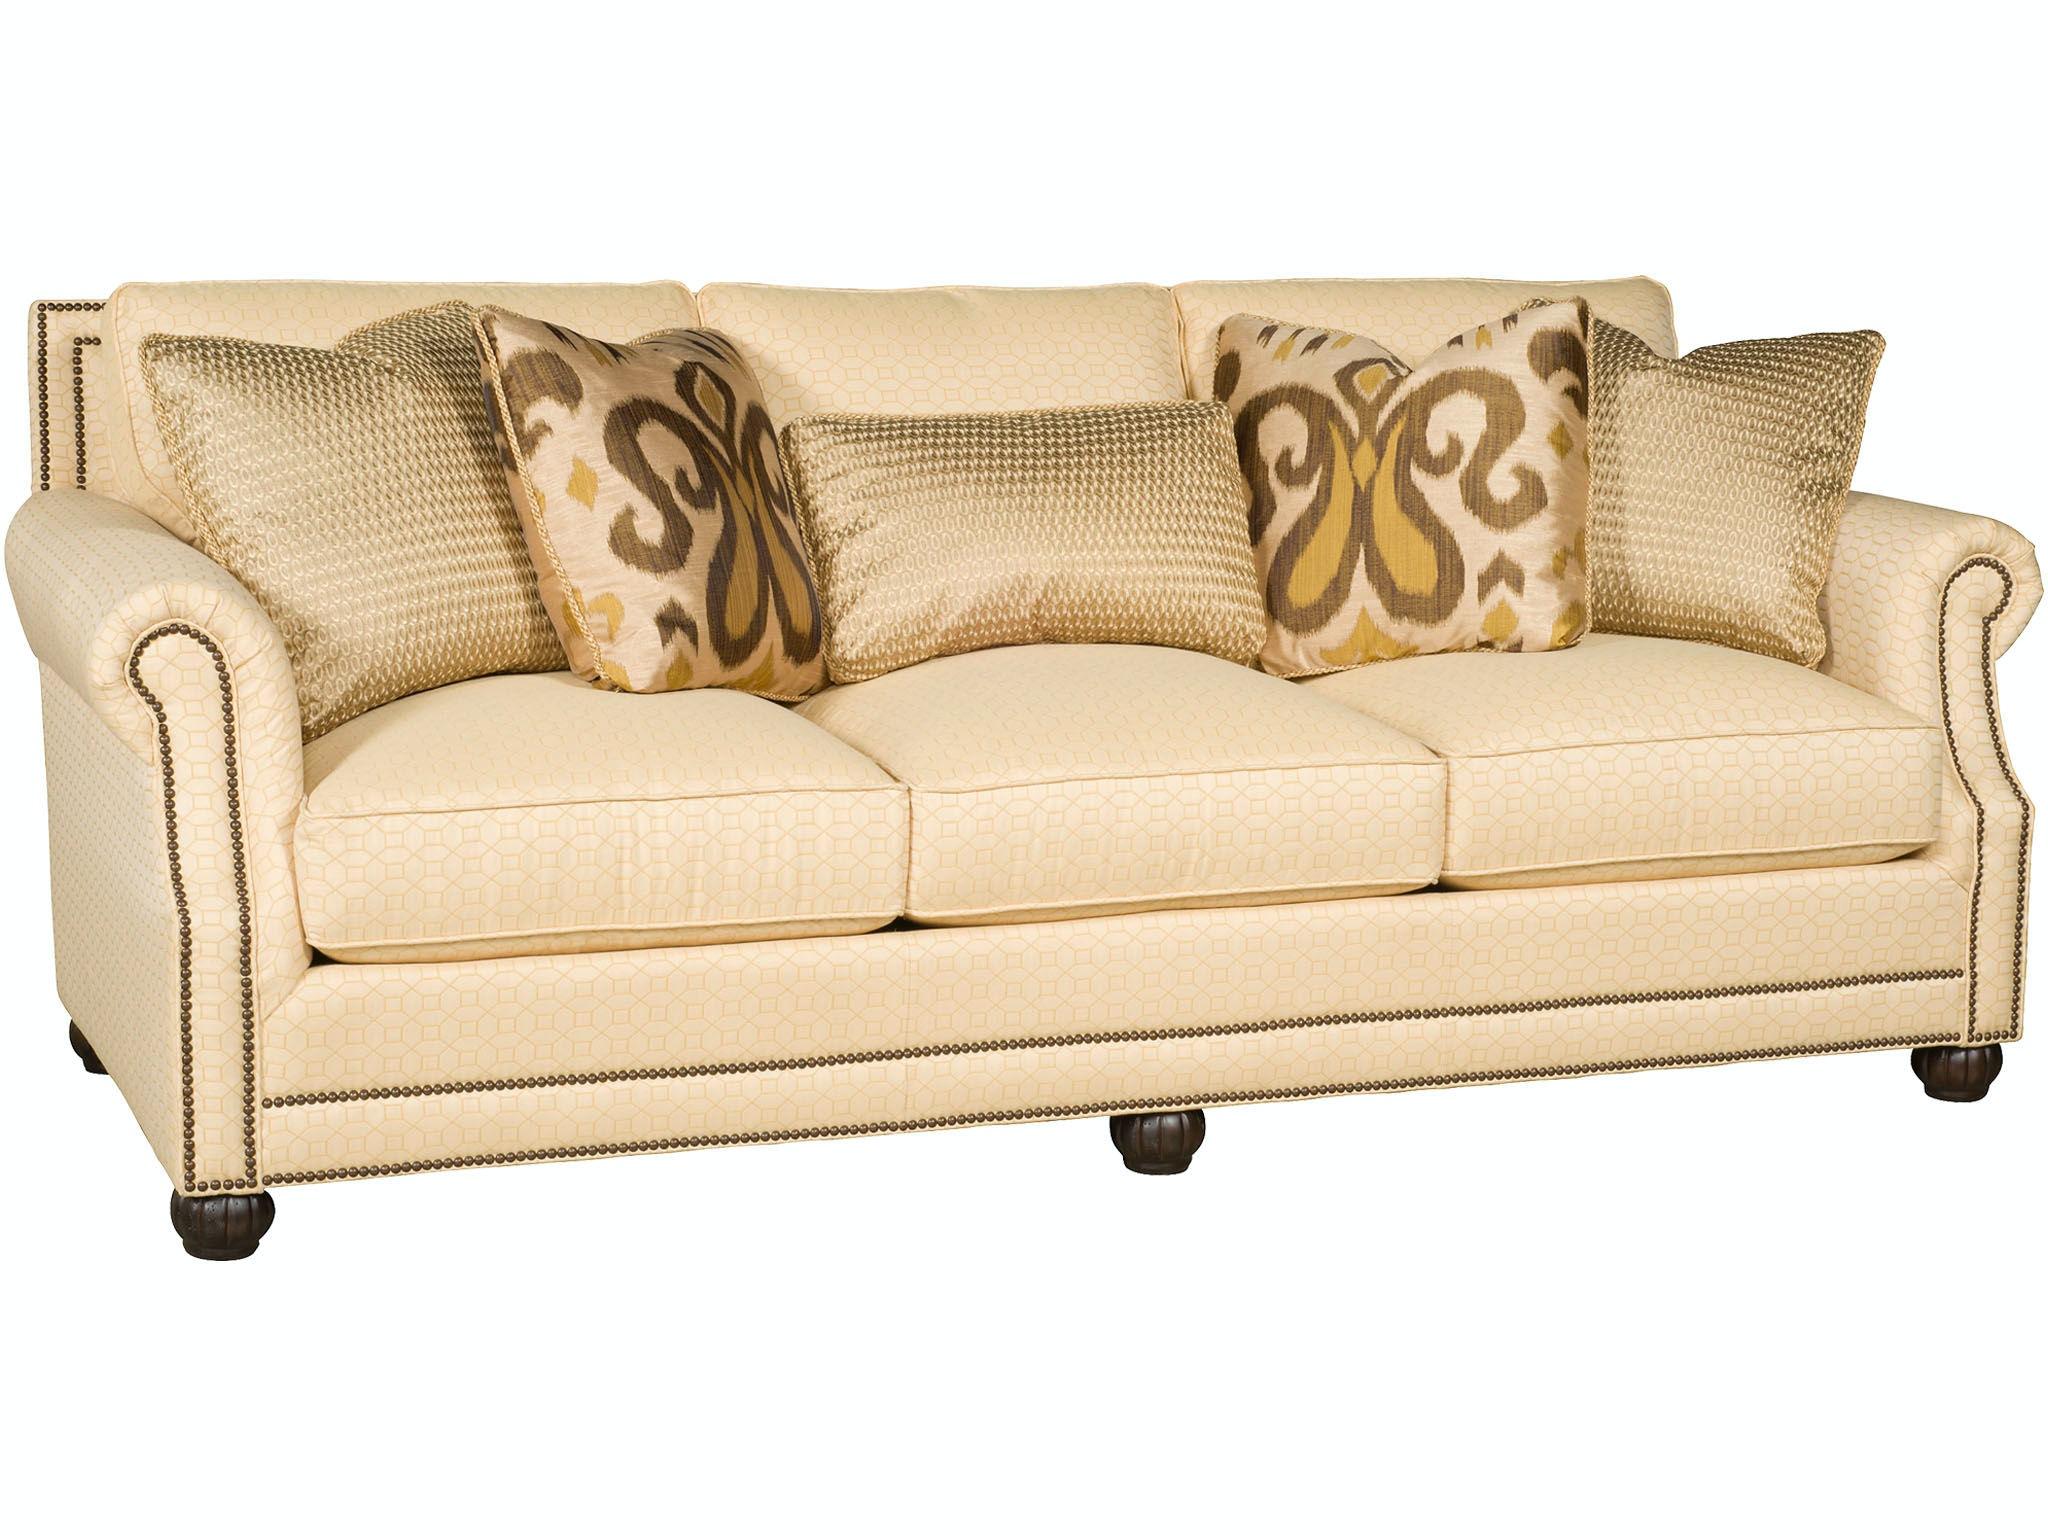 King Hickory Julianna Fabric Sofa 3000